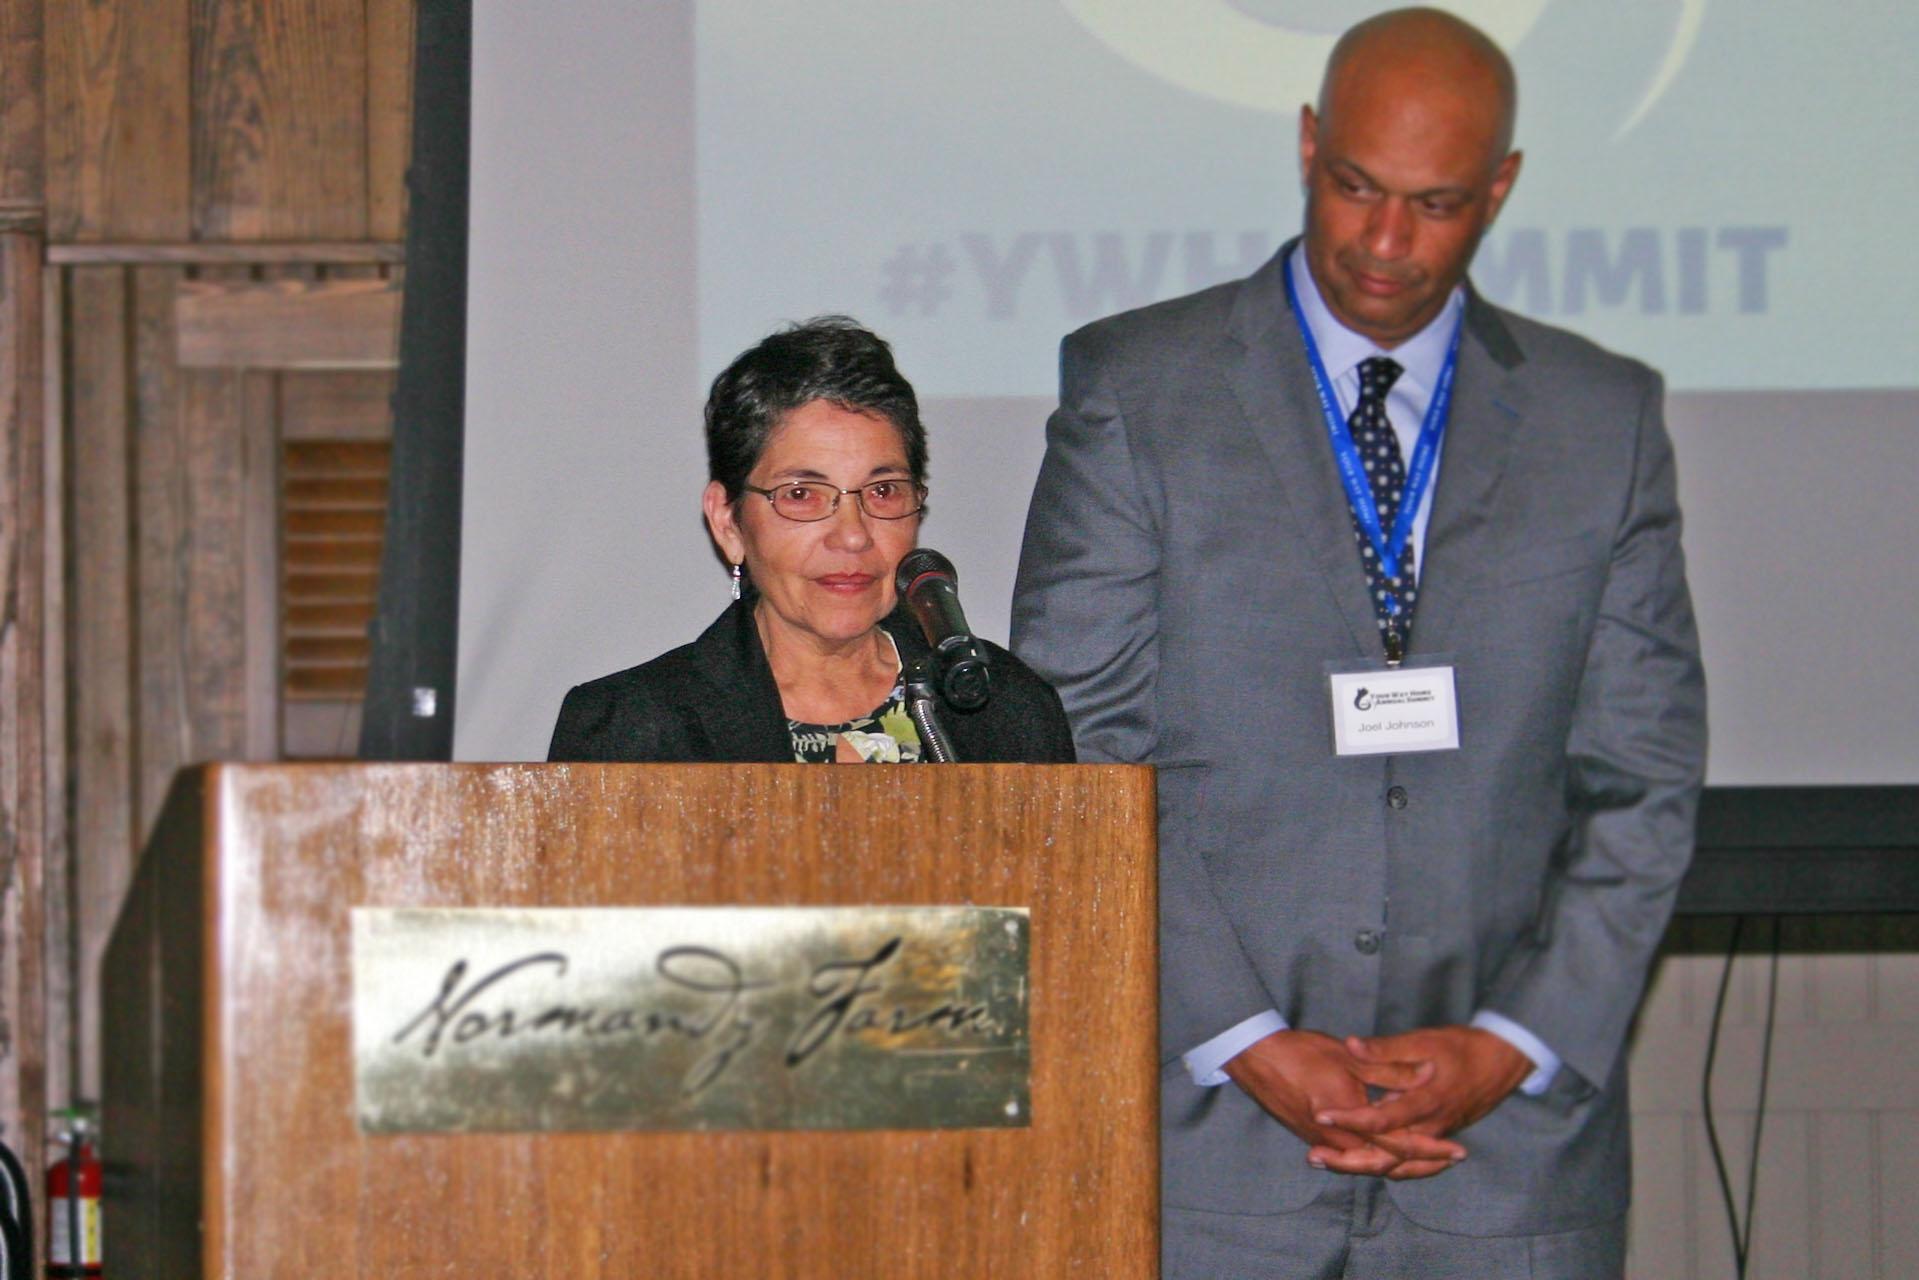 Ann Garcia at podium.jpg